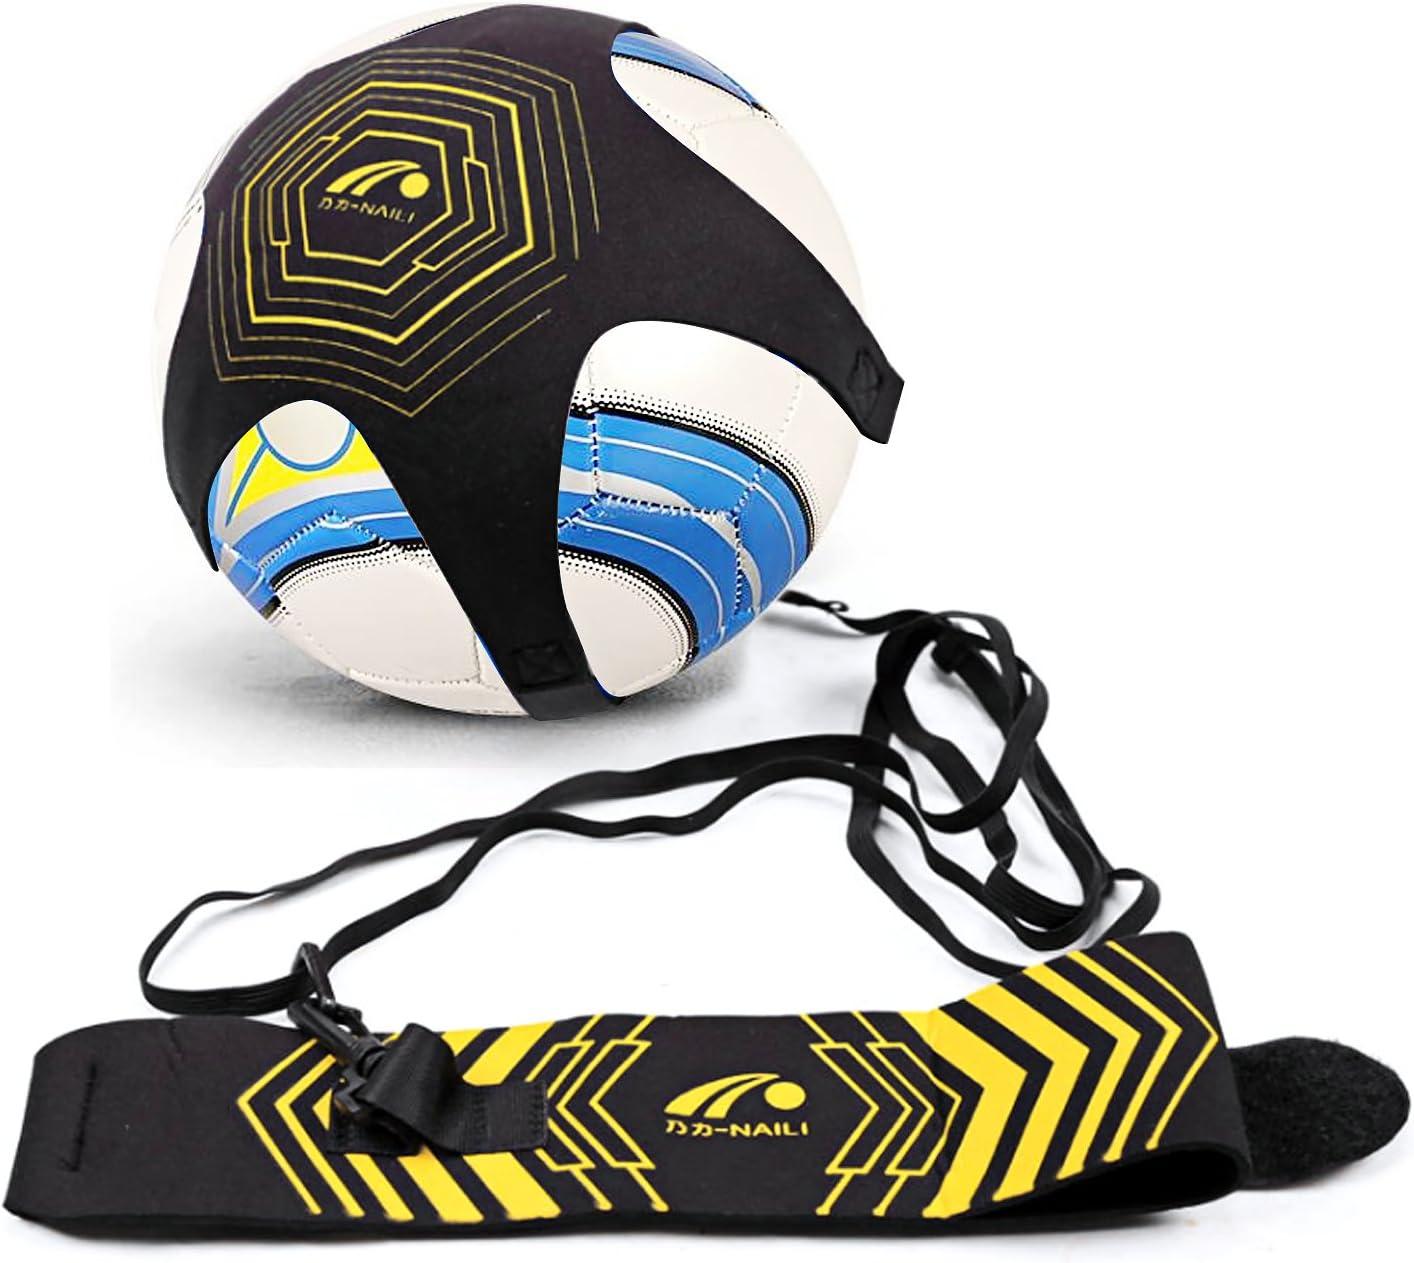 Football Star Kick Football Practice Training Aid Solo Soccer Trainer Returner